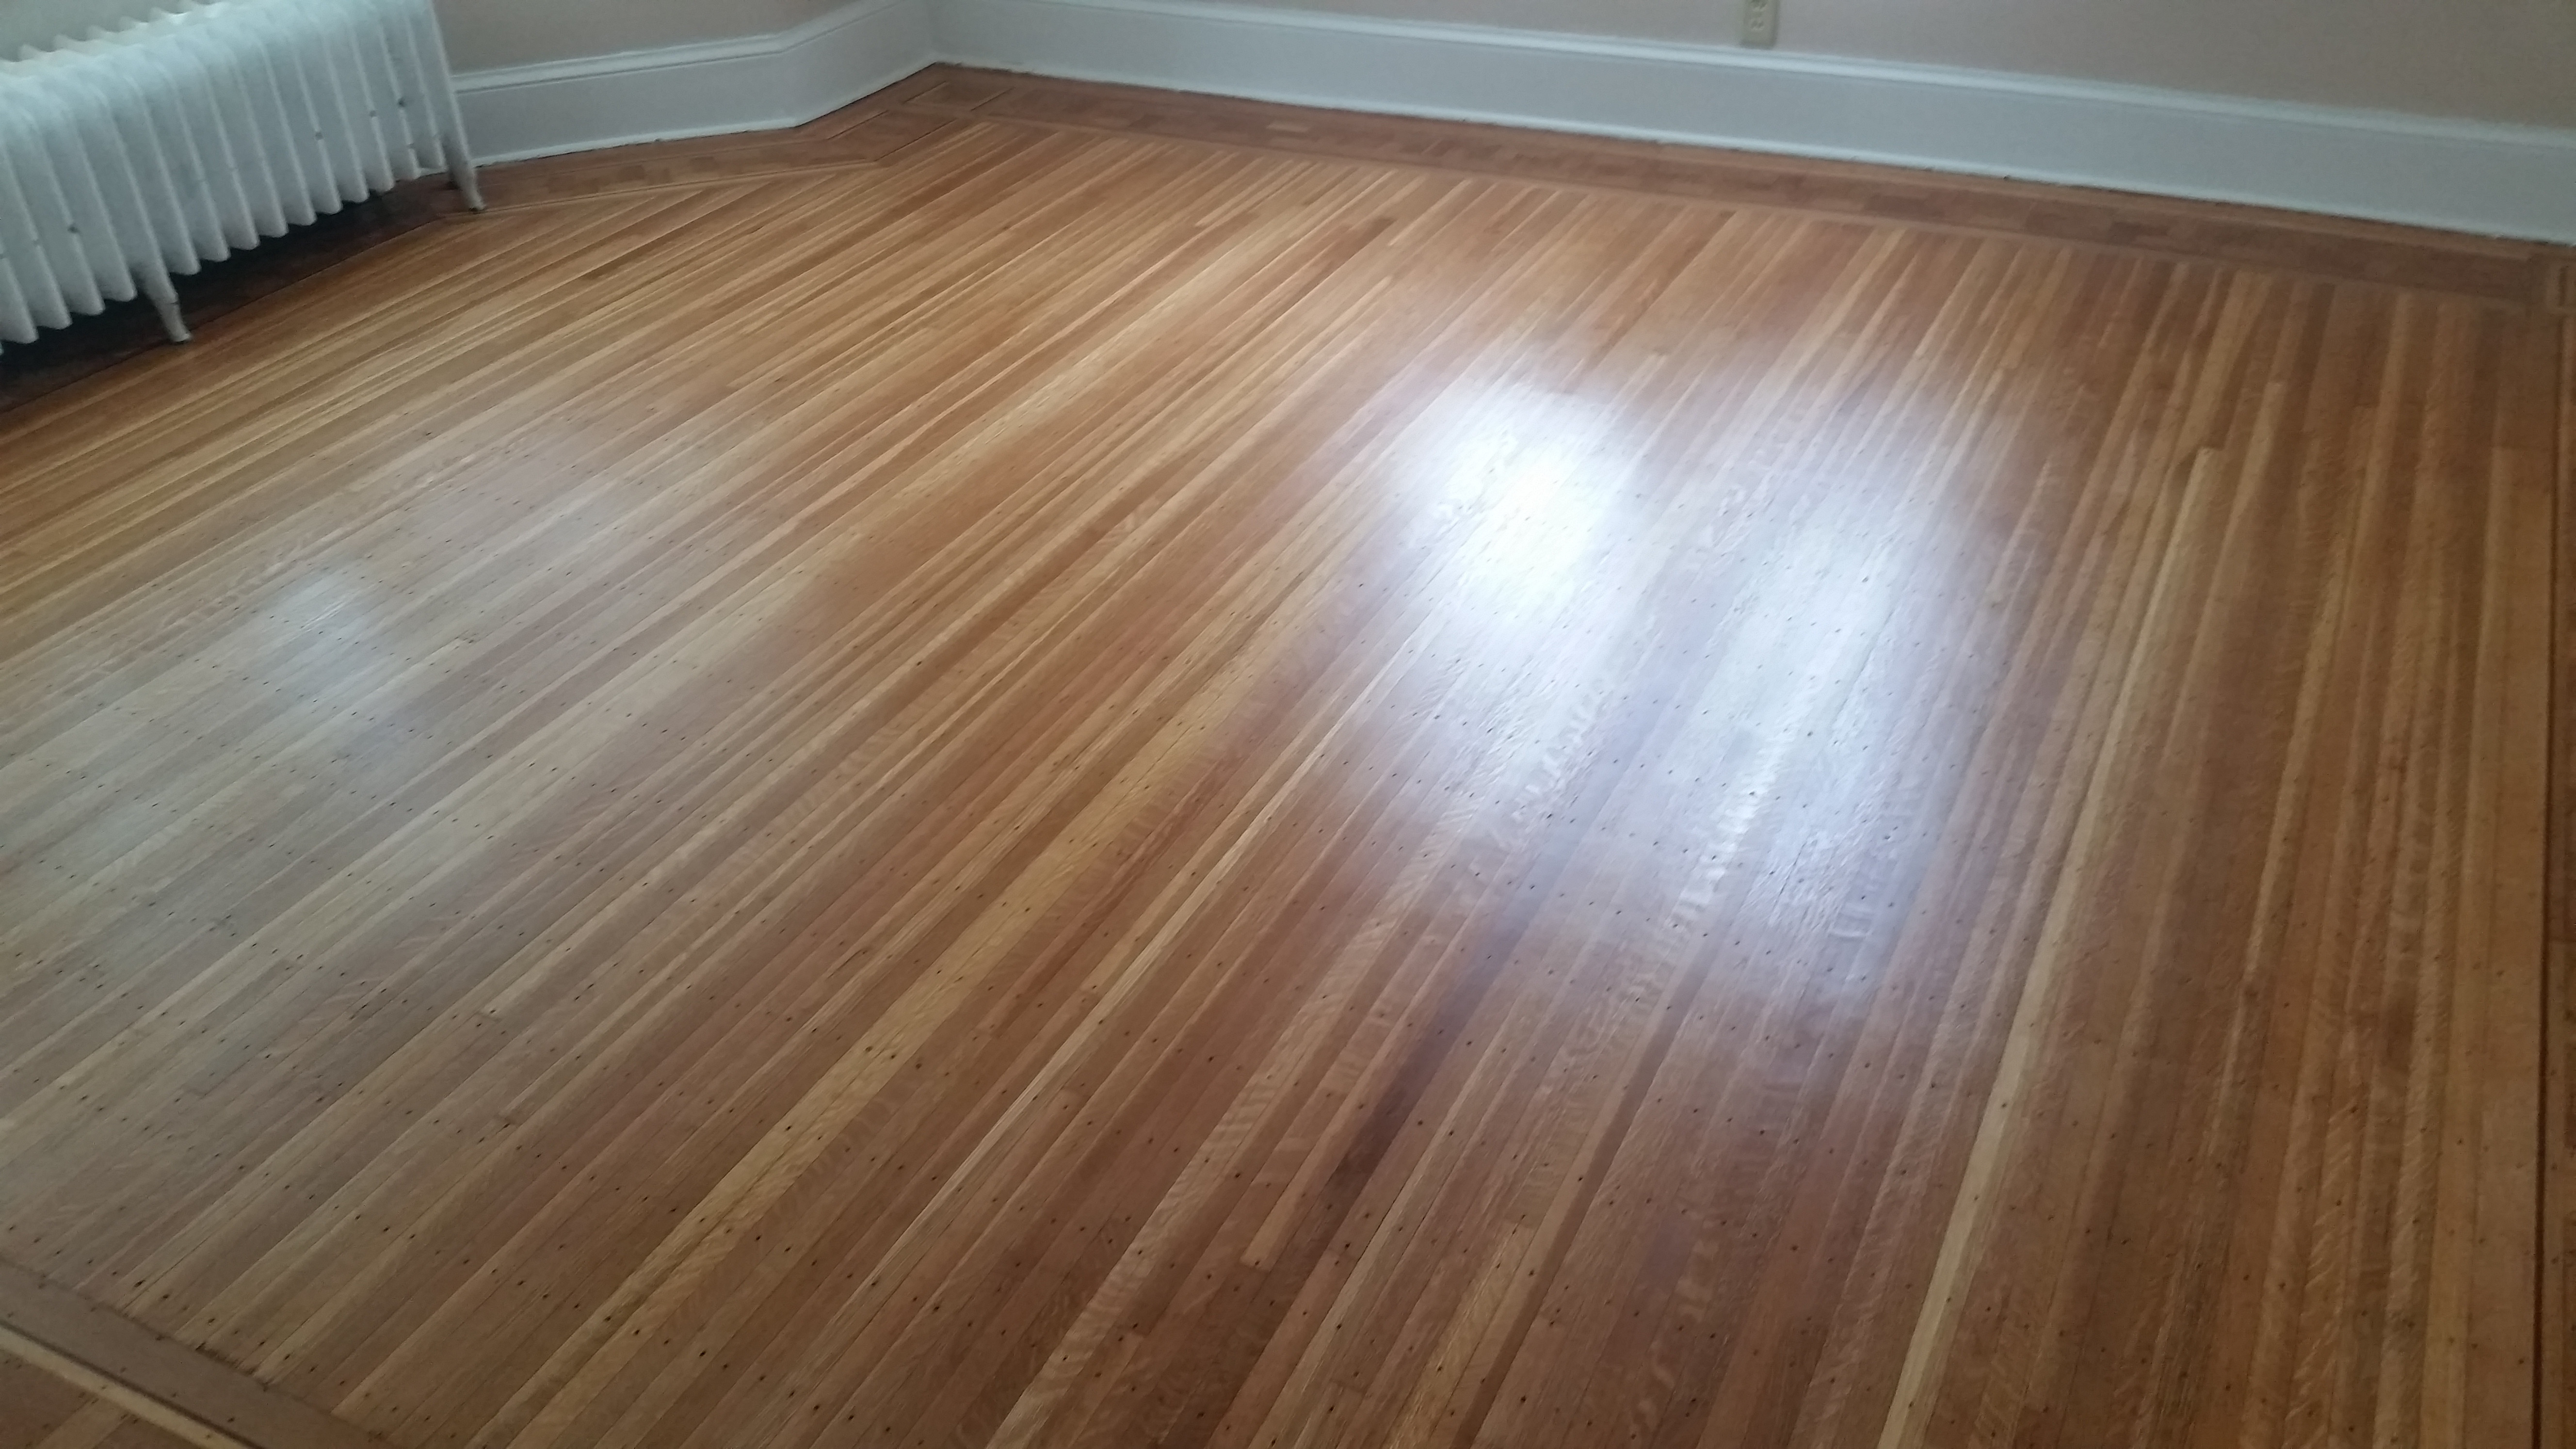 17 Spectacular Hardwood Floor Repair Companies Near Me